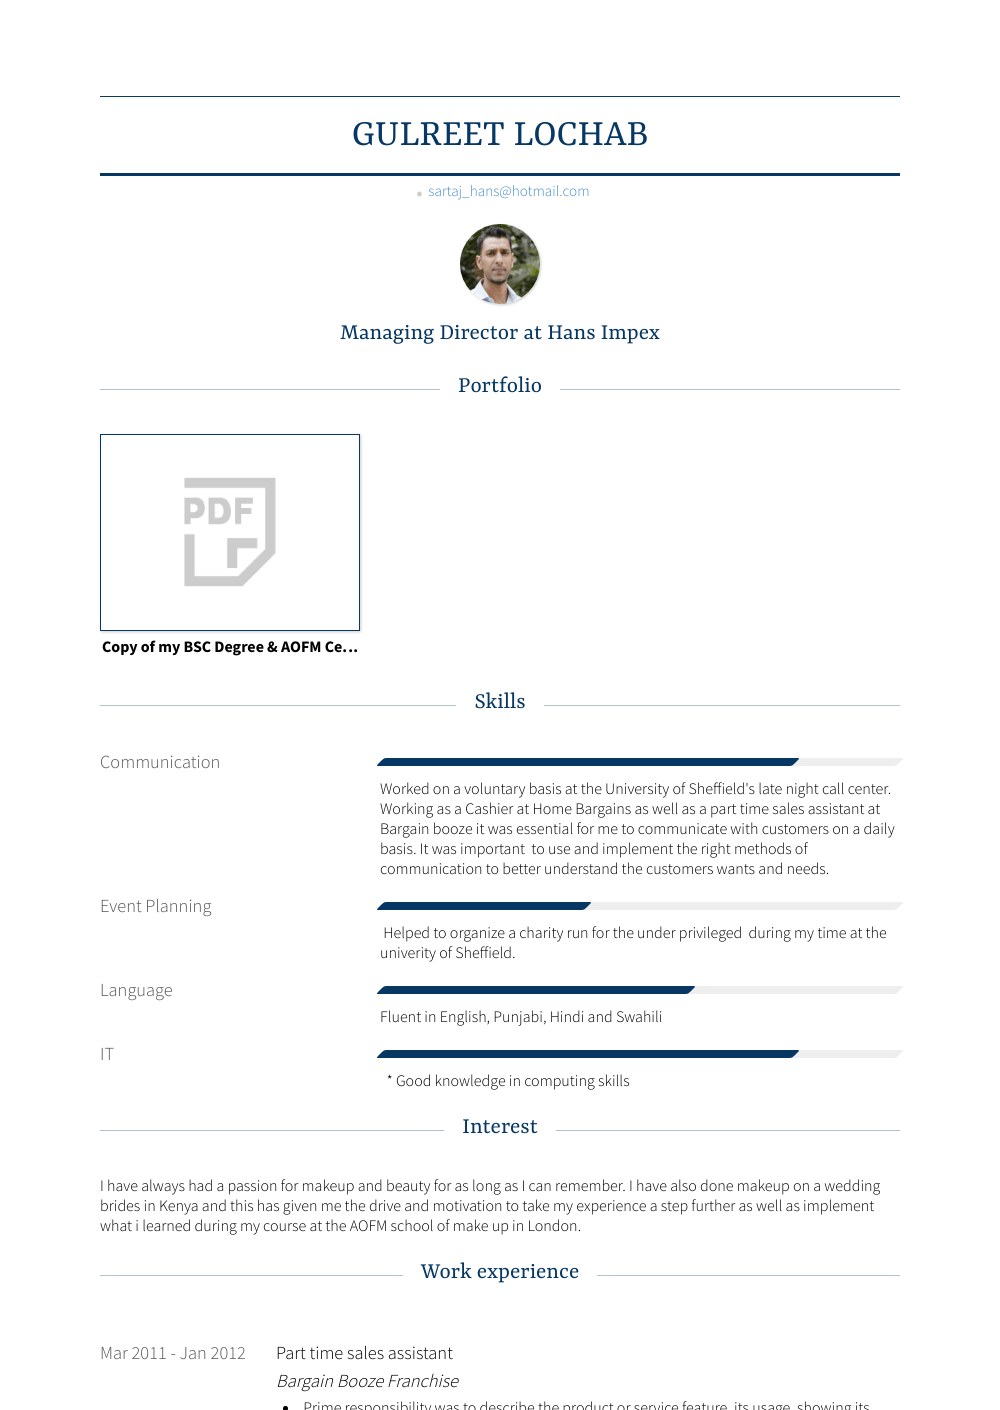 skills part of resumes